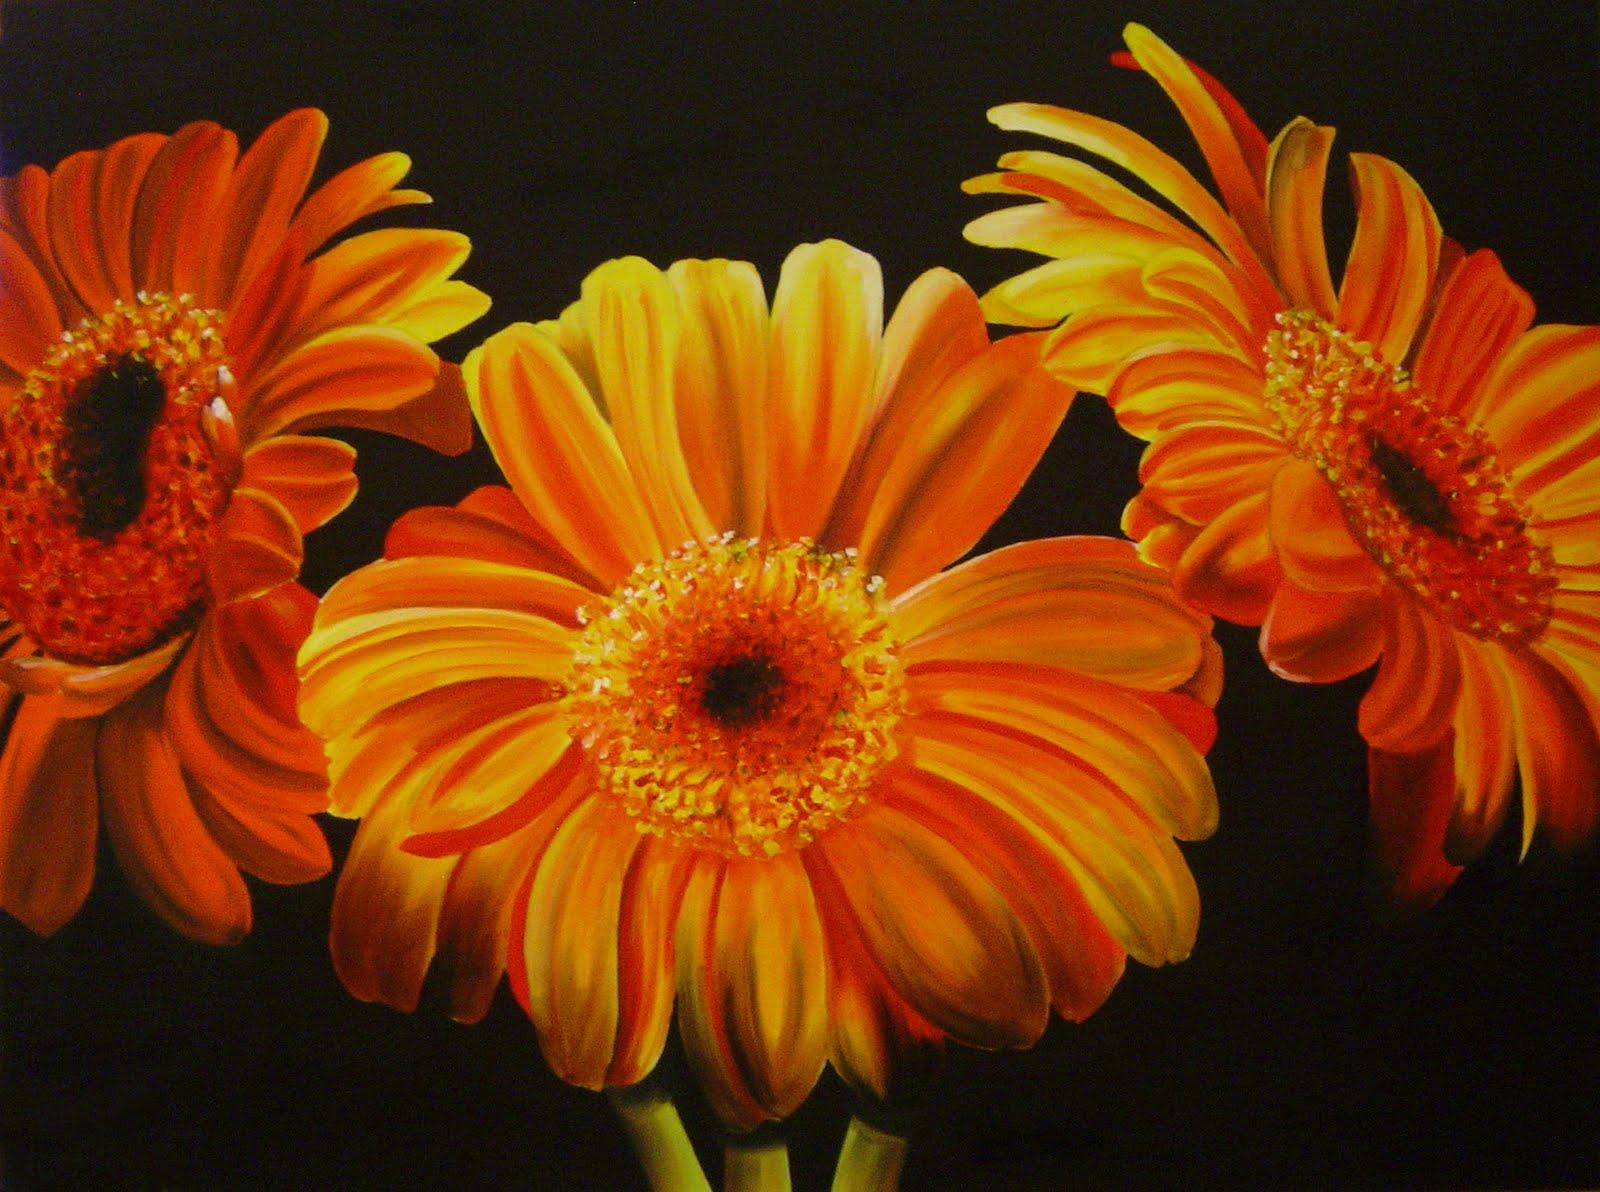 Flower For Respect: Orange Gerberas